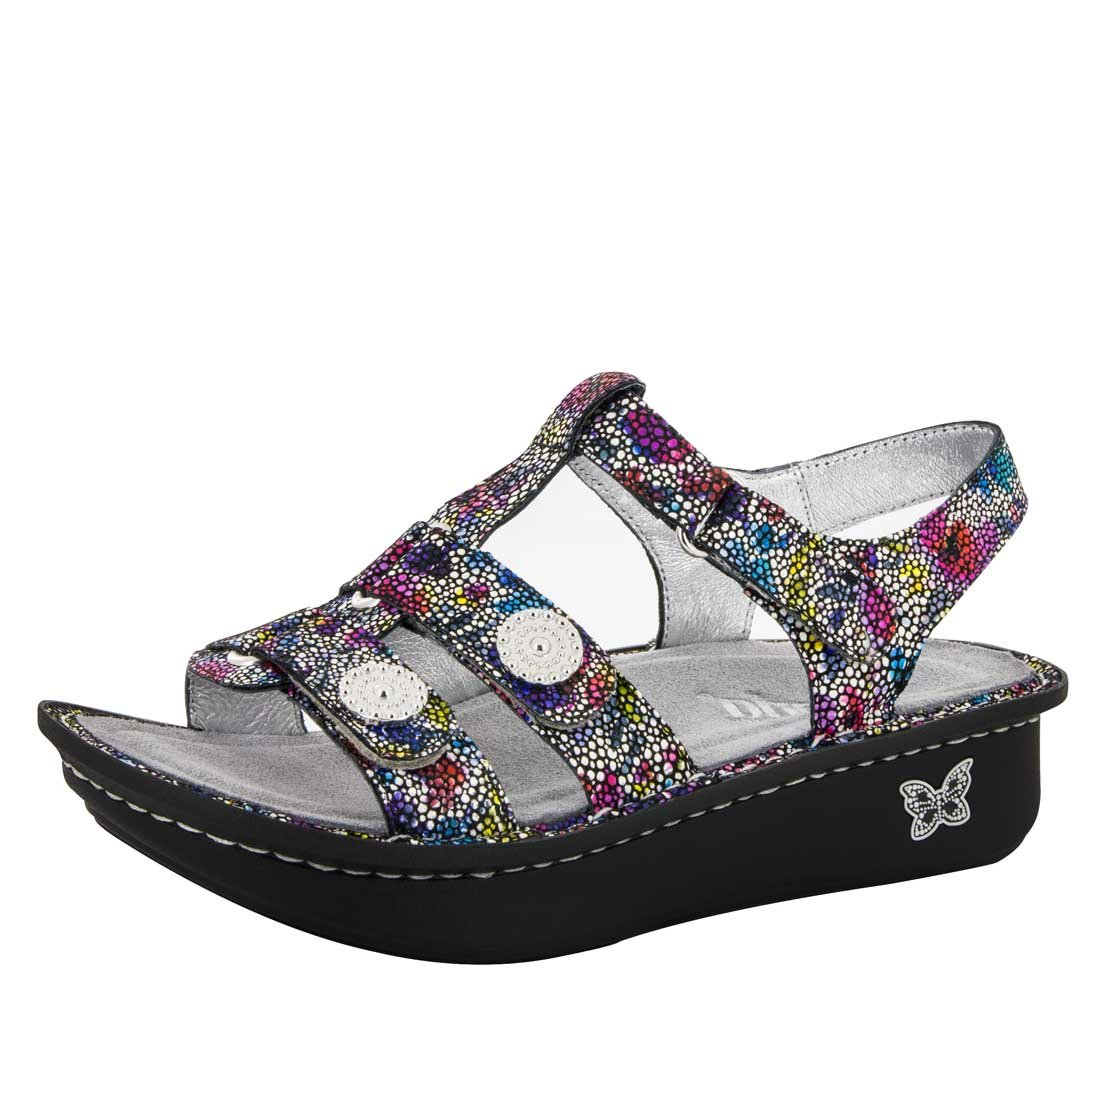 Blissful Alegria Women's Debra Sandal